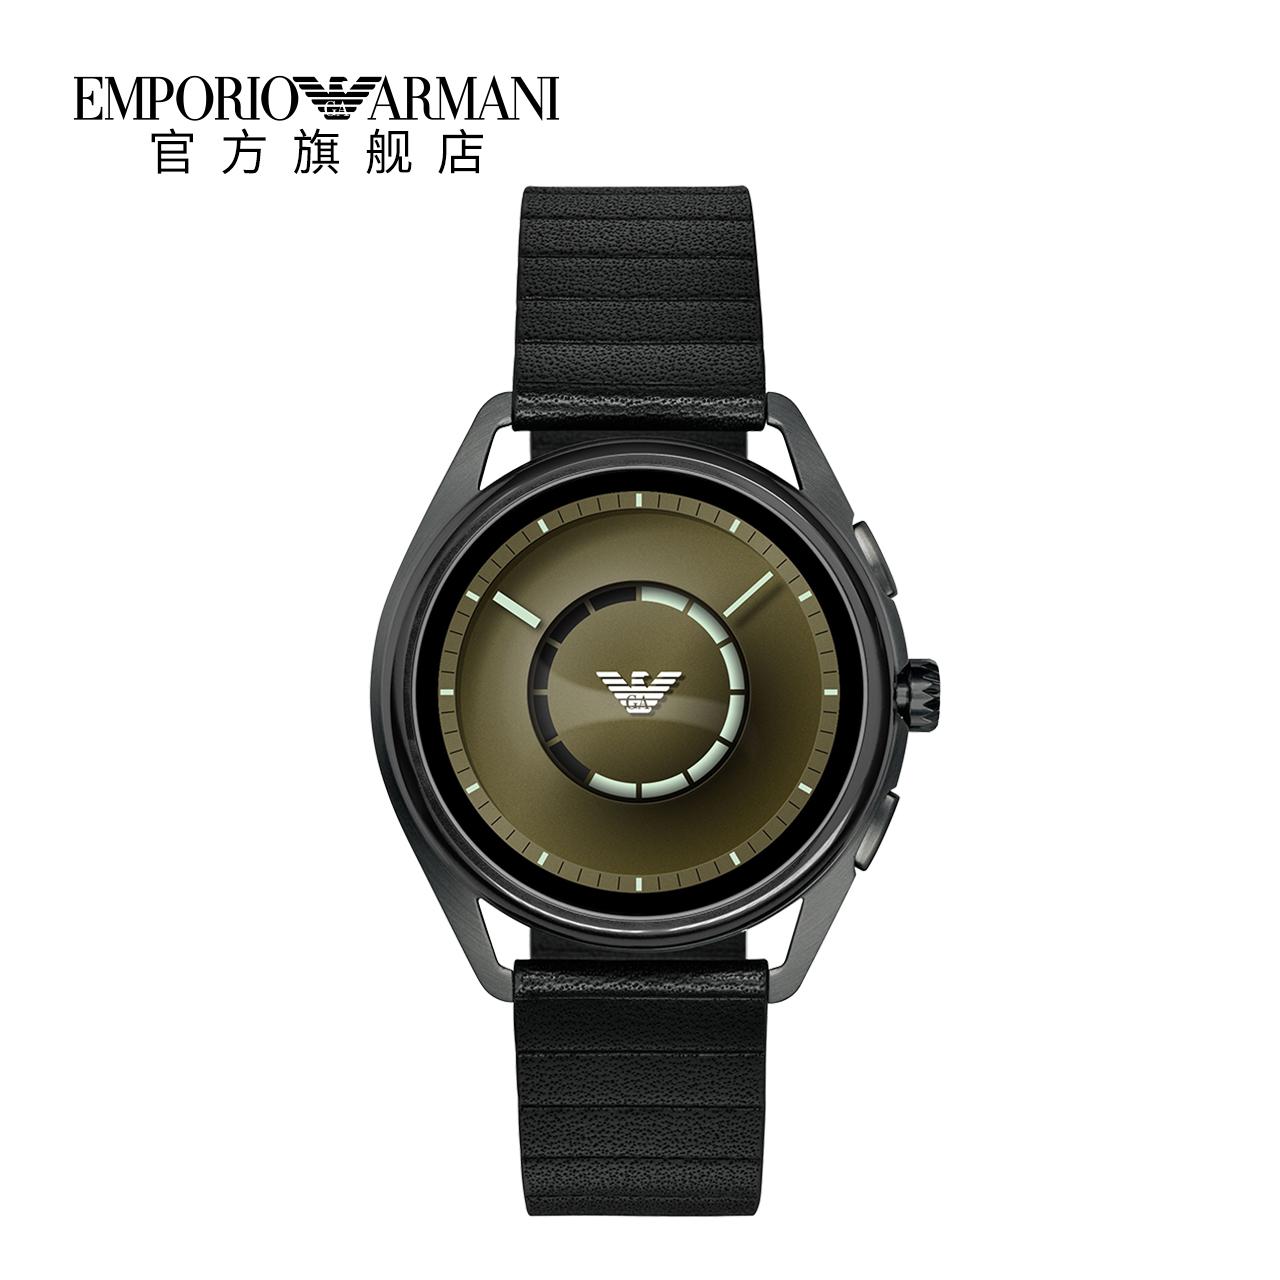 Armani阿玛尼时尚潮流智能腕表 简约绿色表盘电子手表男ART5009